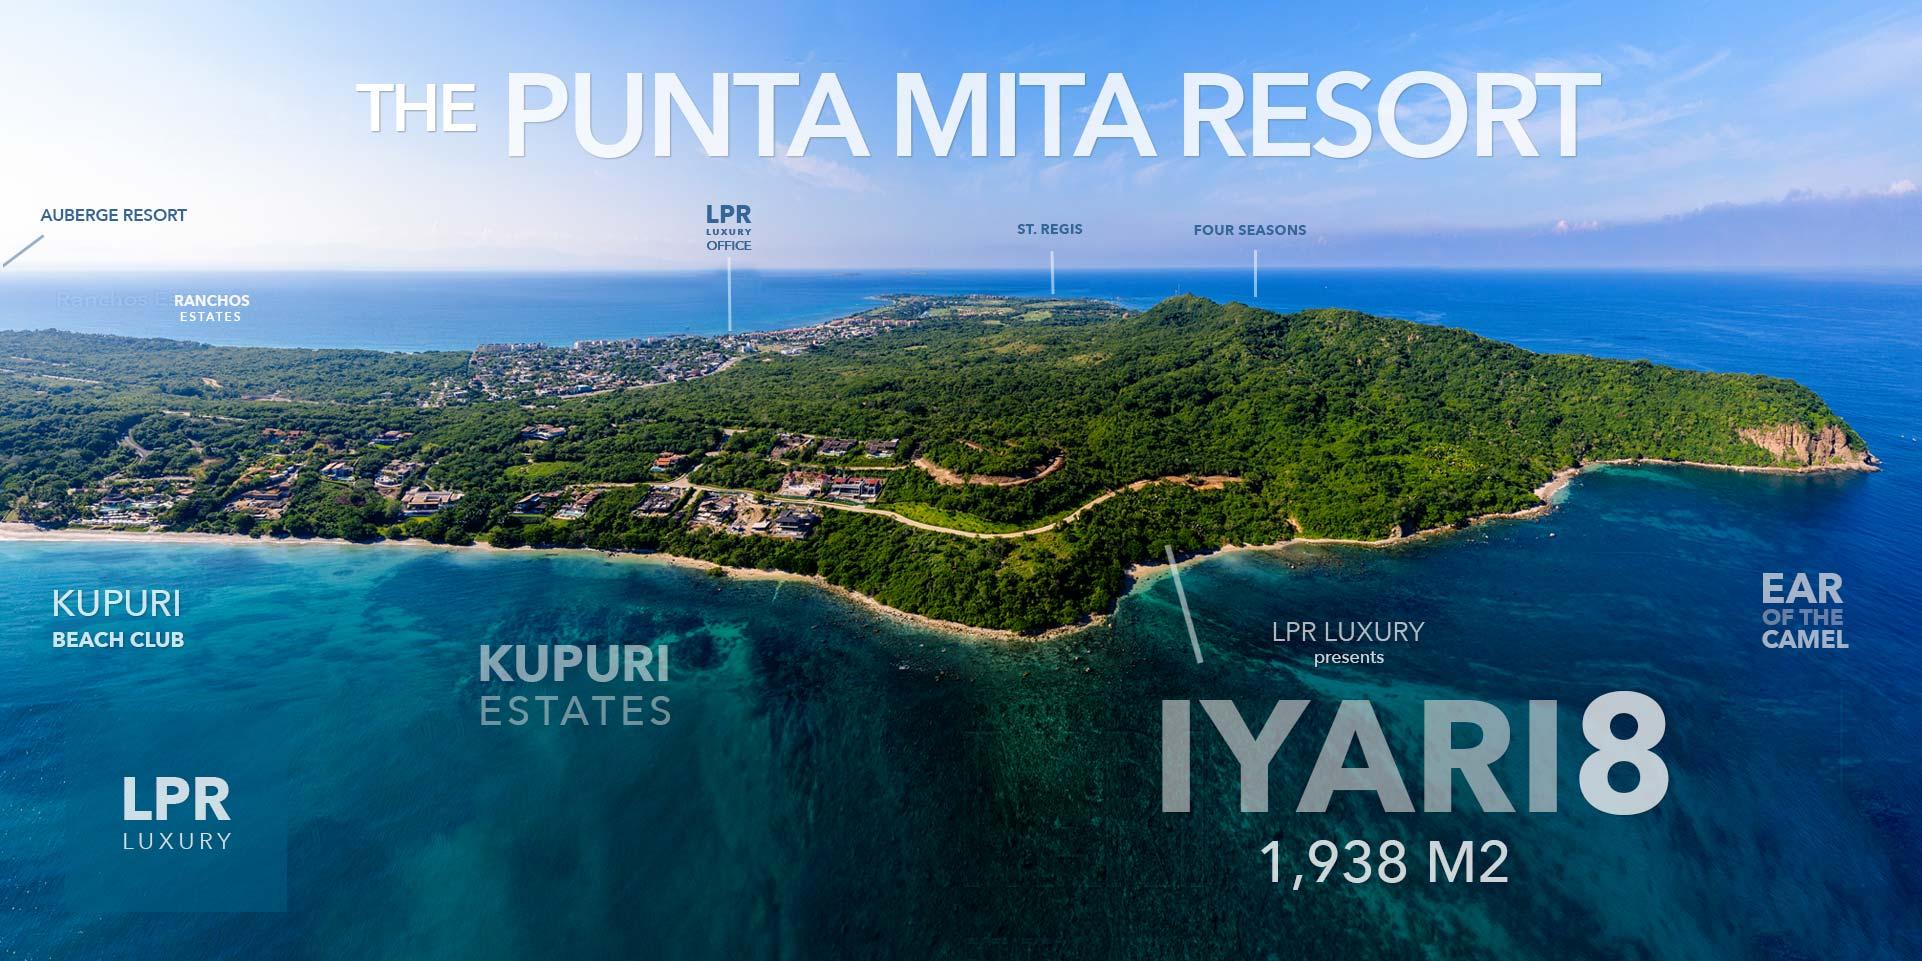 Iyari - Lot 8 - Punta Mita - Luxury real estate - Homes and homesite at the Punta Mita Resort